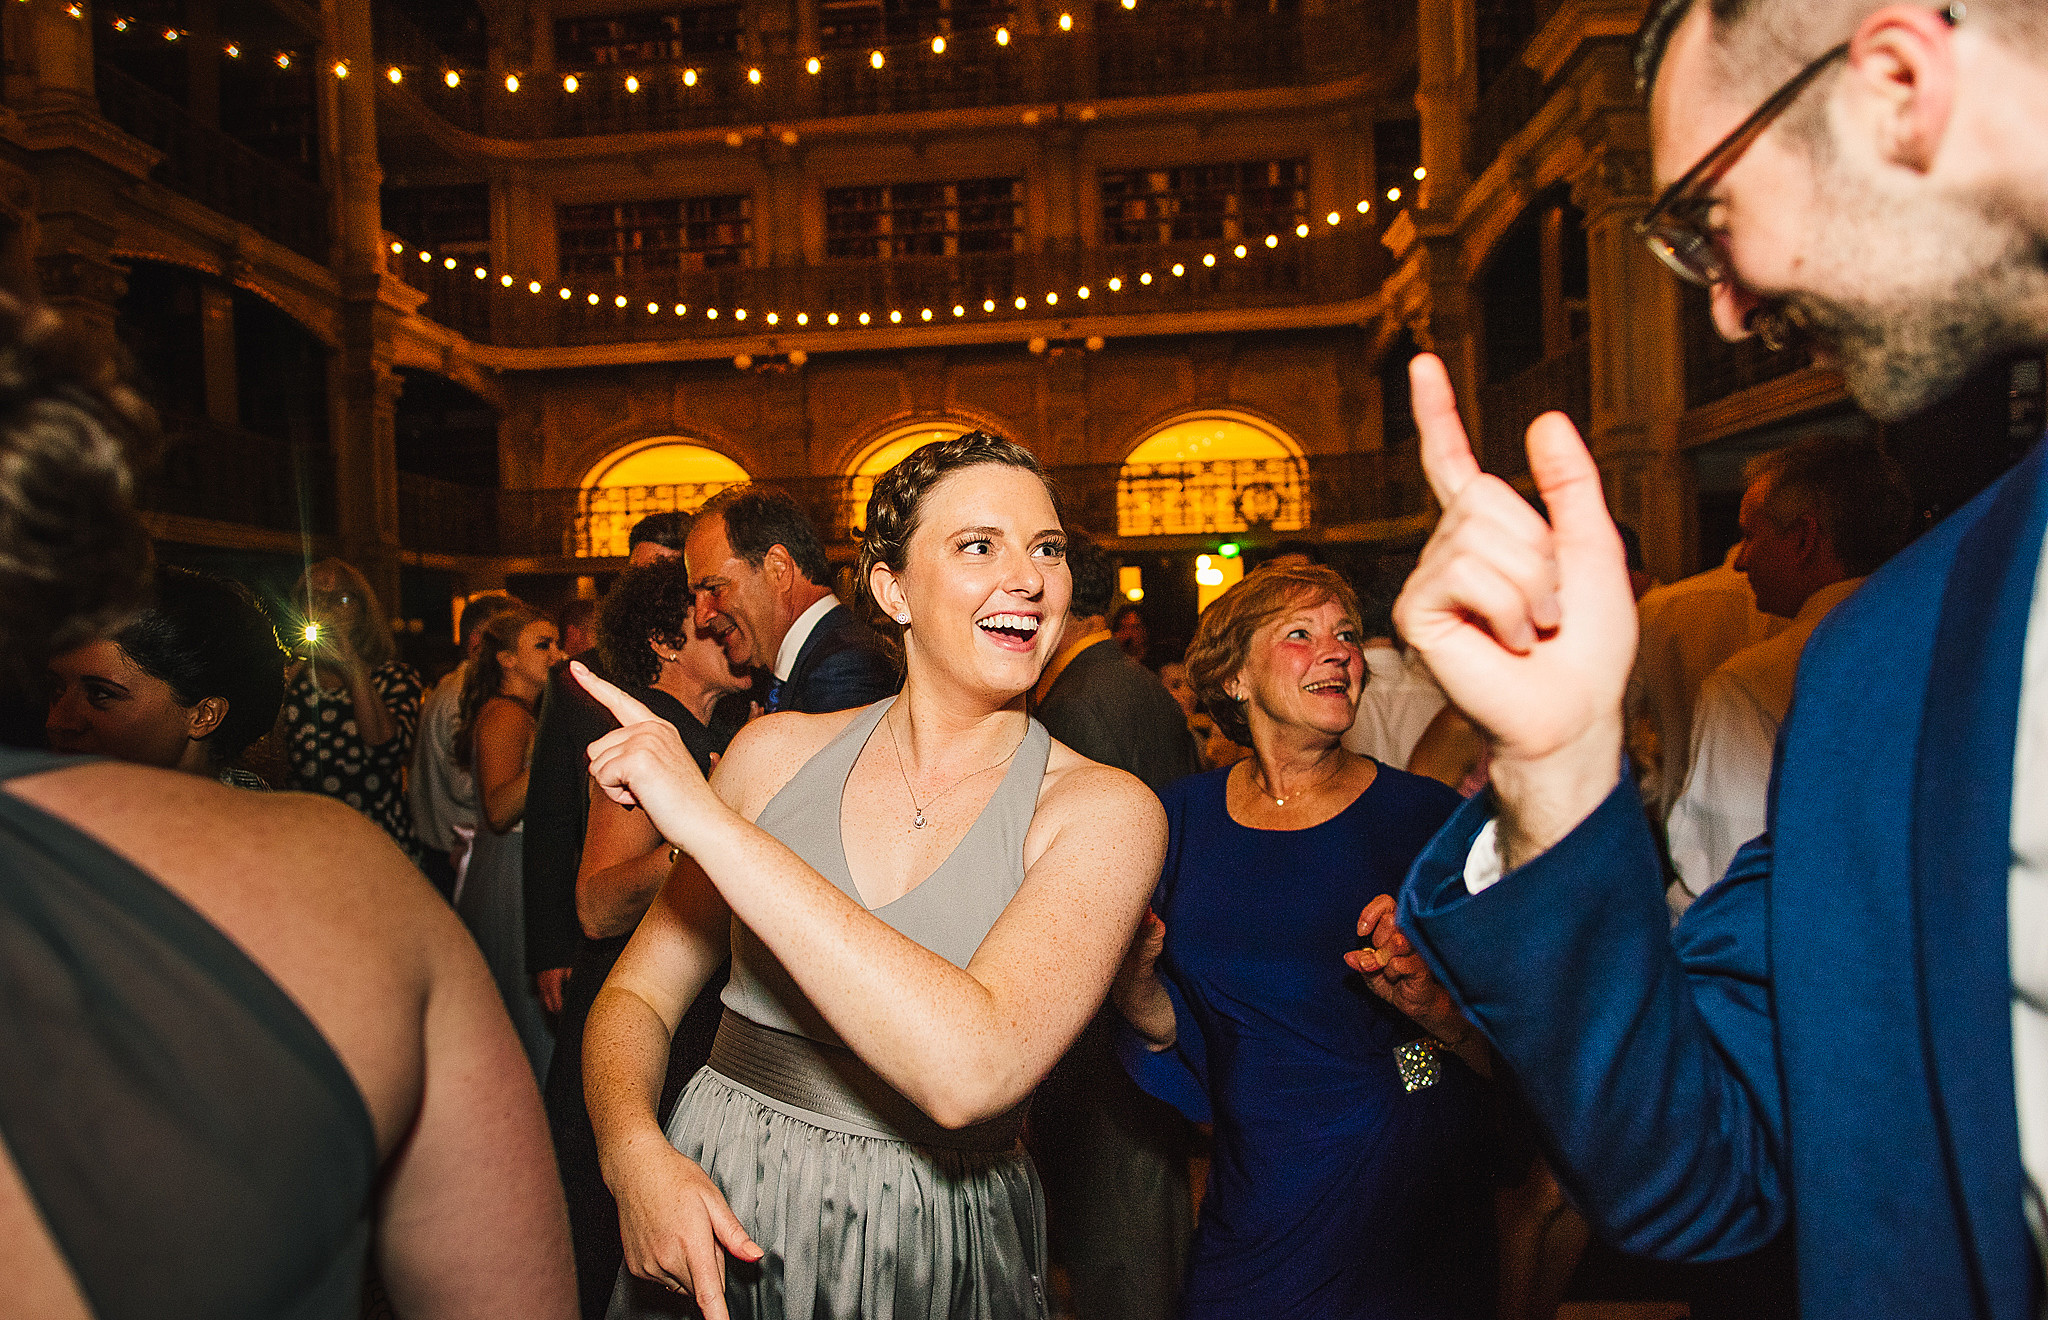 woman in grey dress dances at wedding